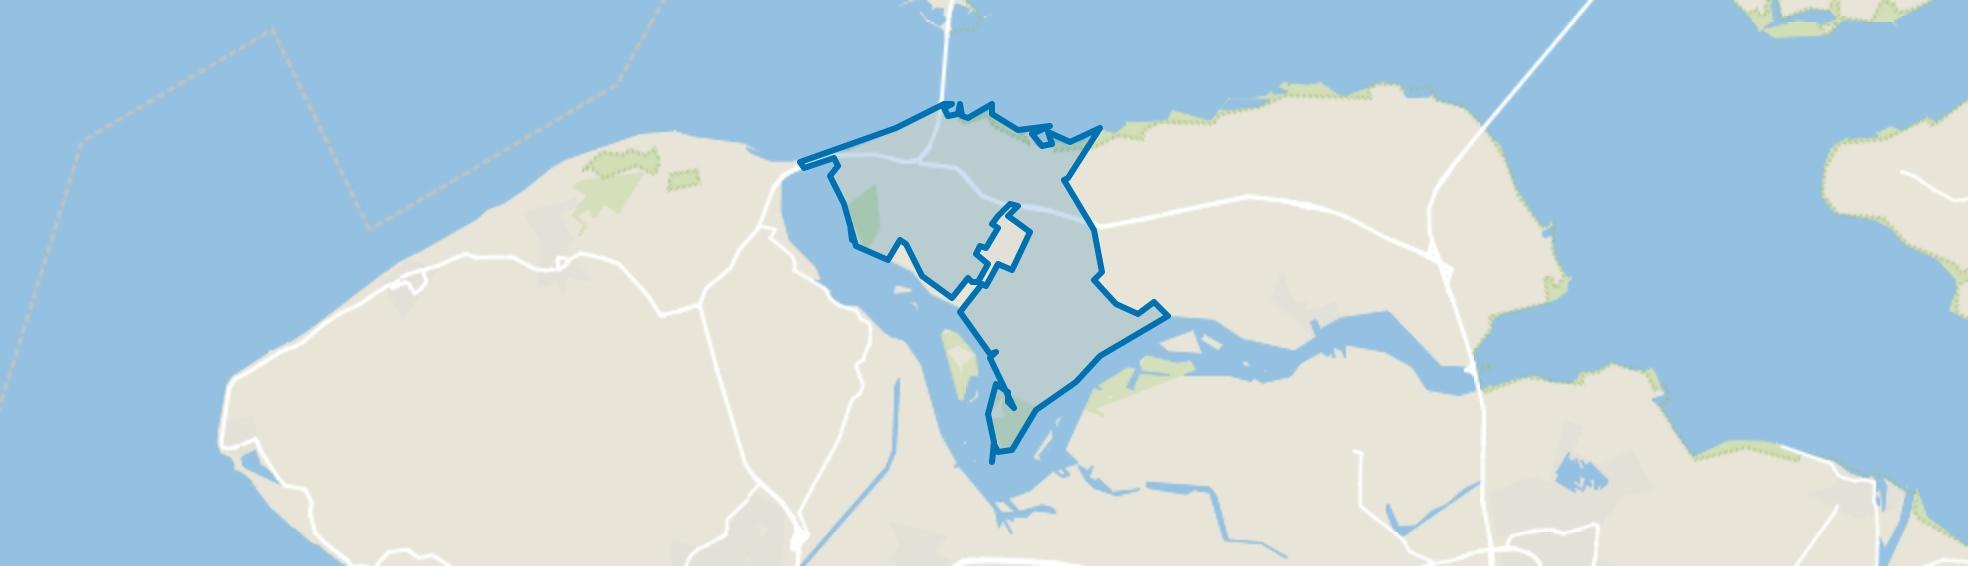 Verspreide huizen Kamperland, Kamperland map